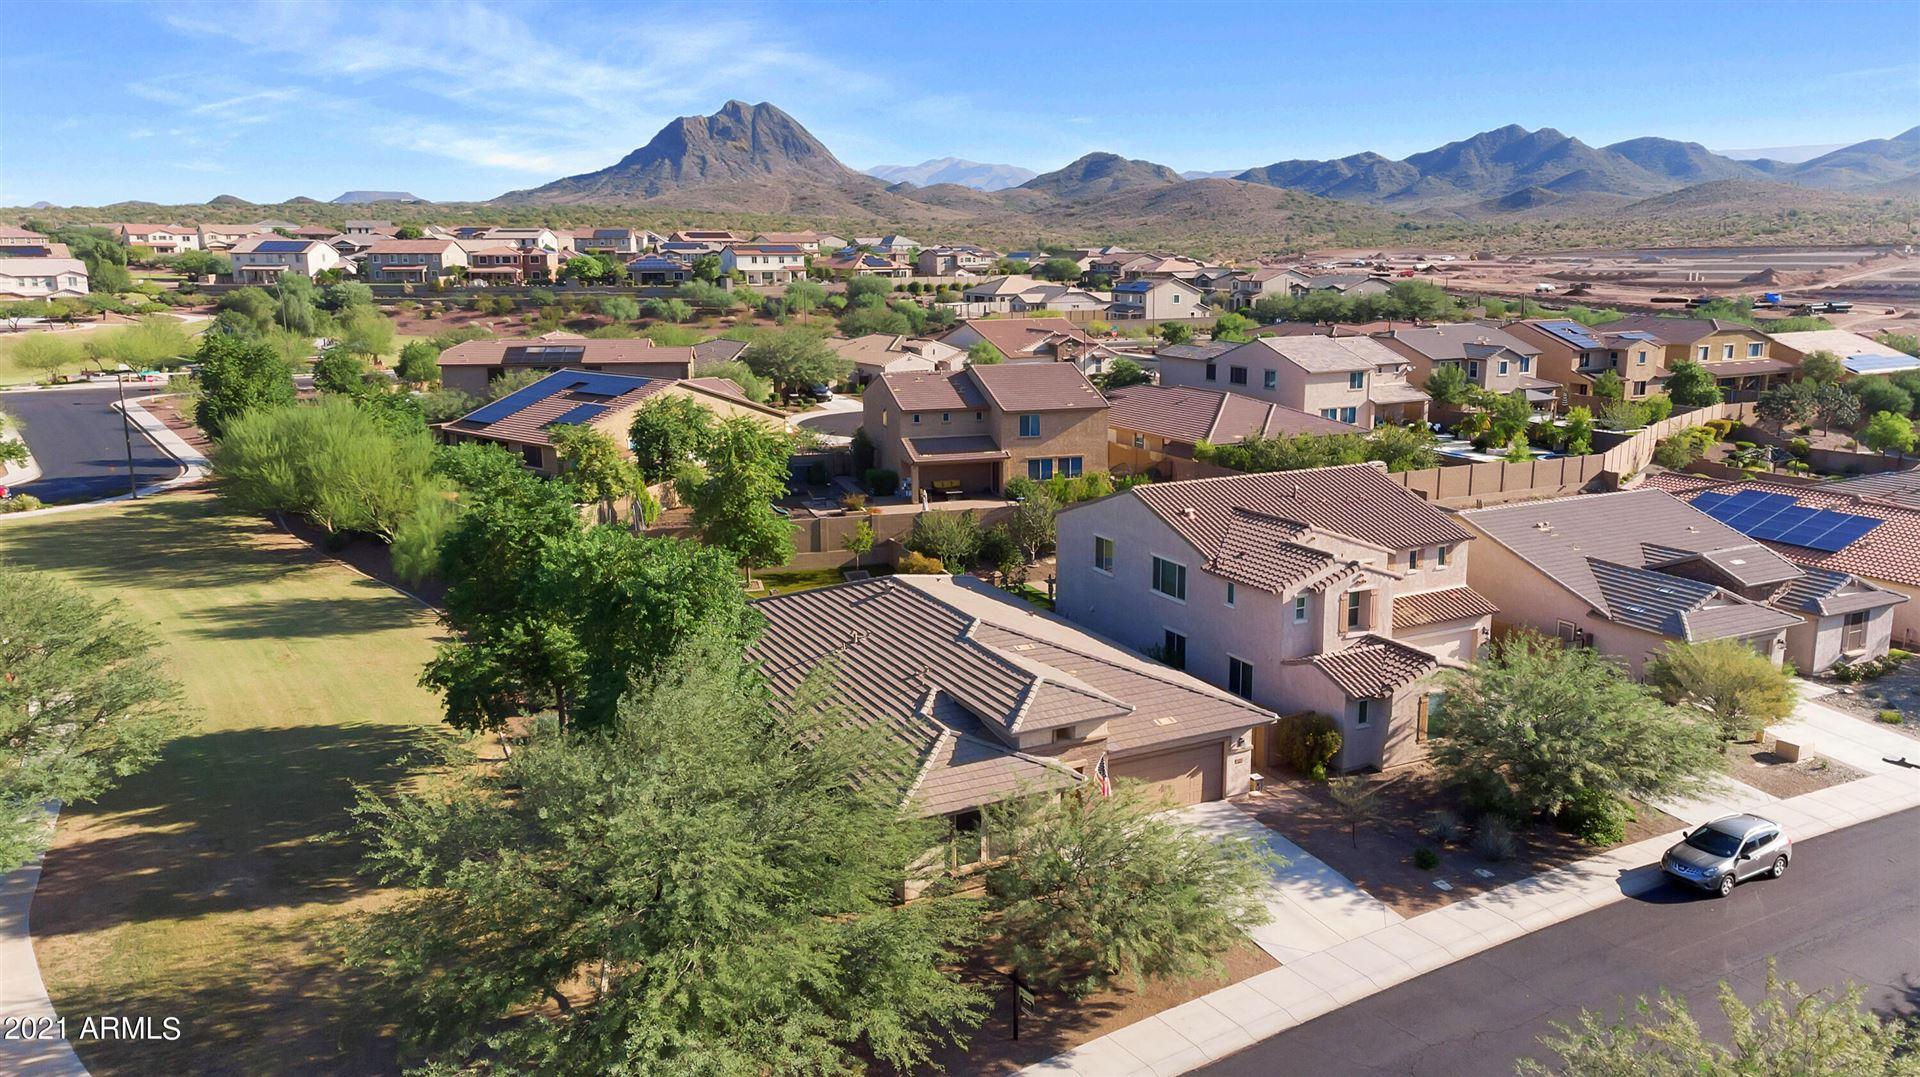 Photo of 3770 W ARACELY Drive, New River, AZ 85087 (MLS # 6303984)